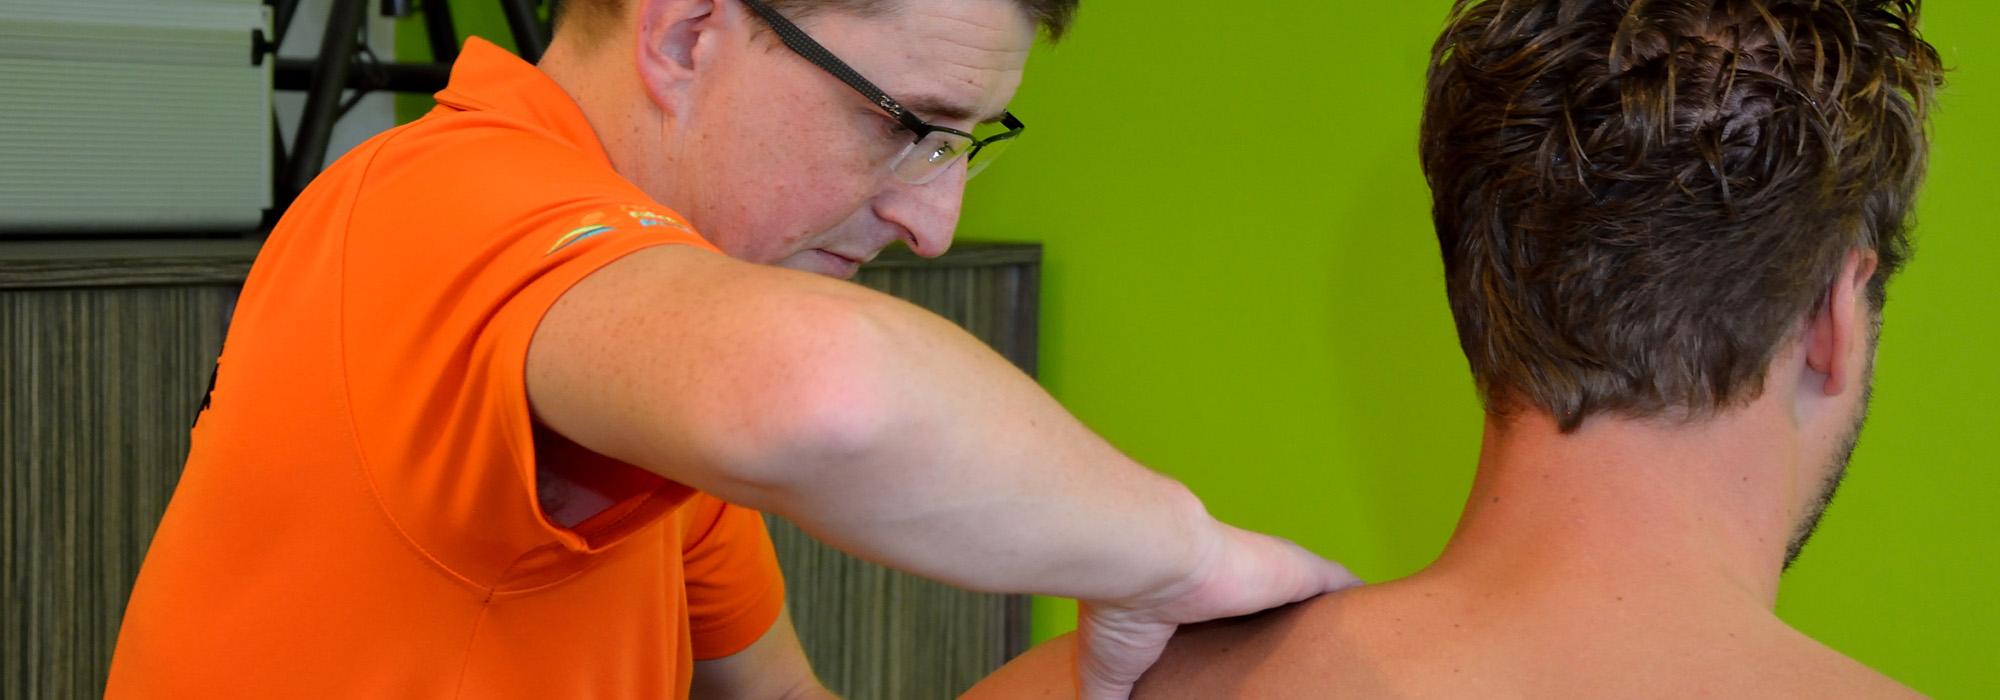 Fysiotherapie De Praktijk